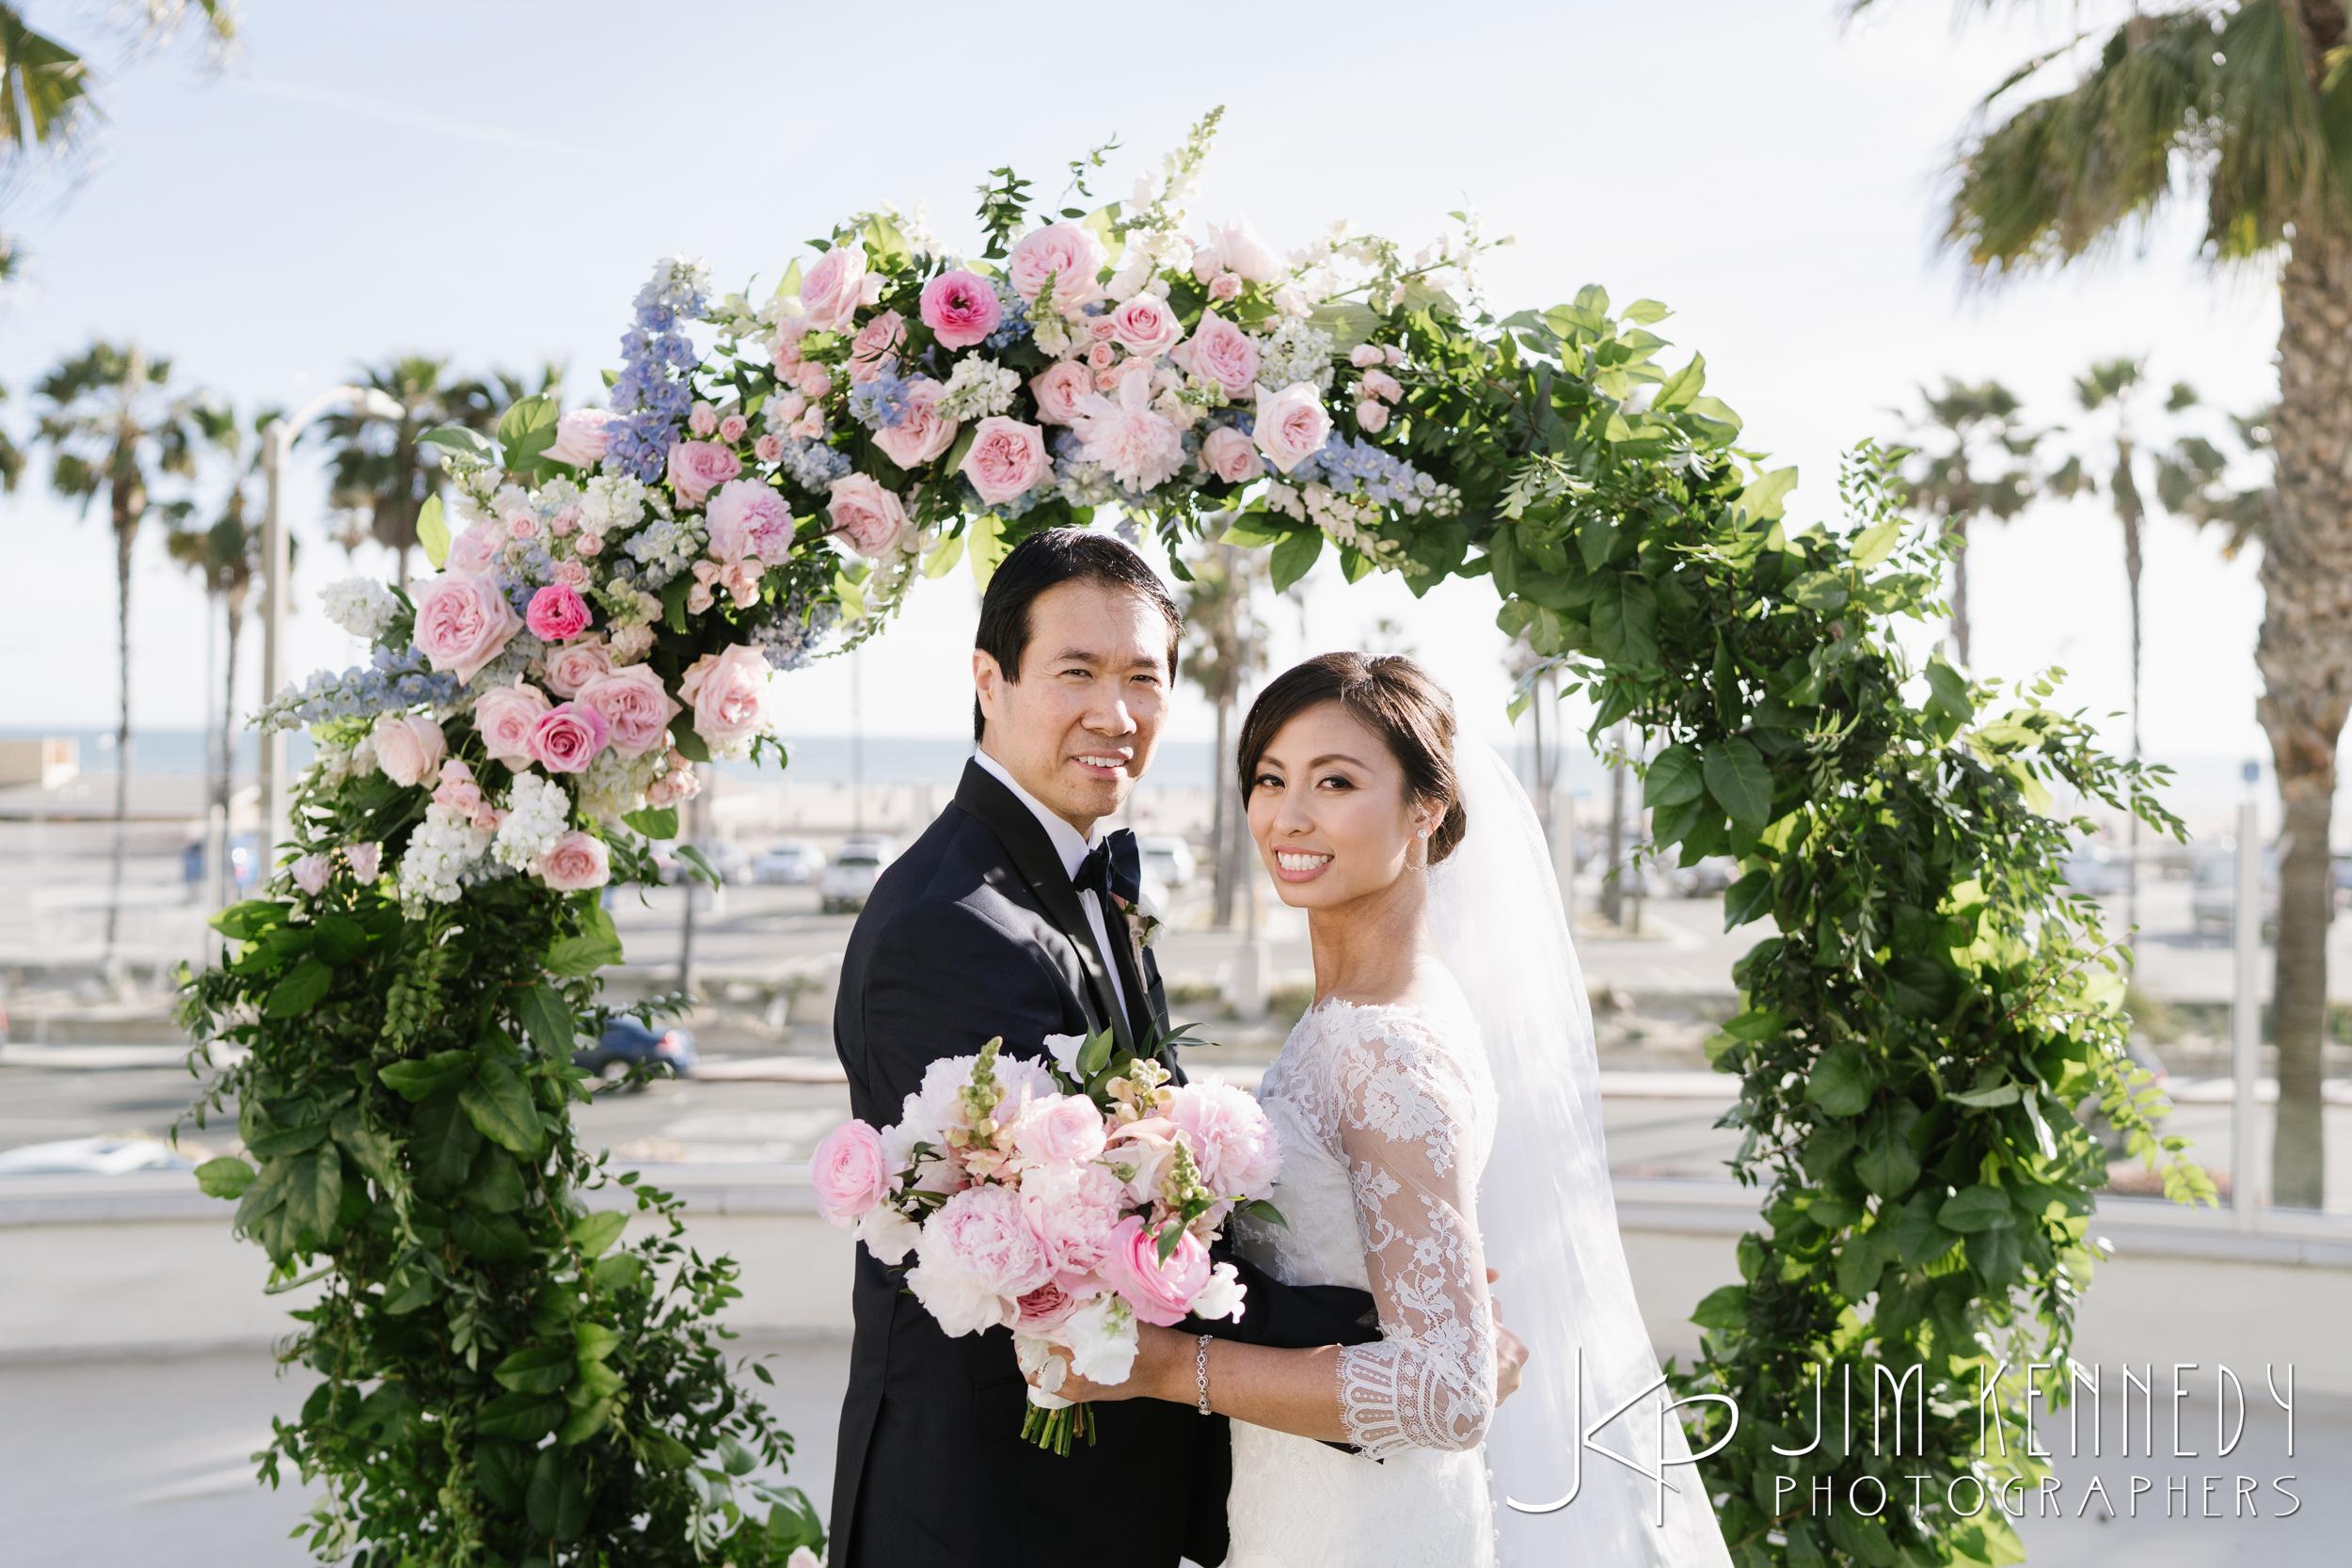 hyatt_huntington_beach_wedding-4990.jpg